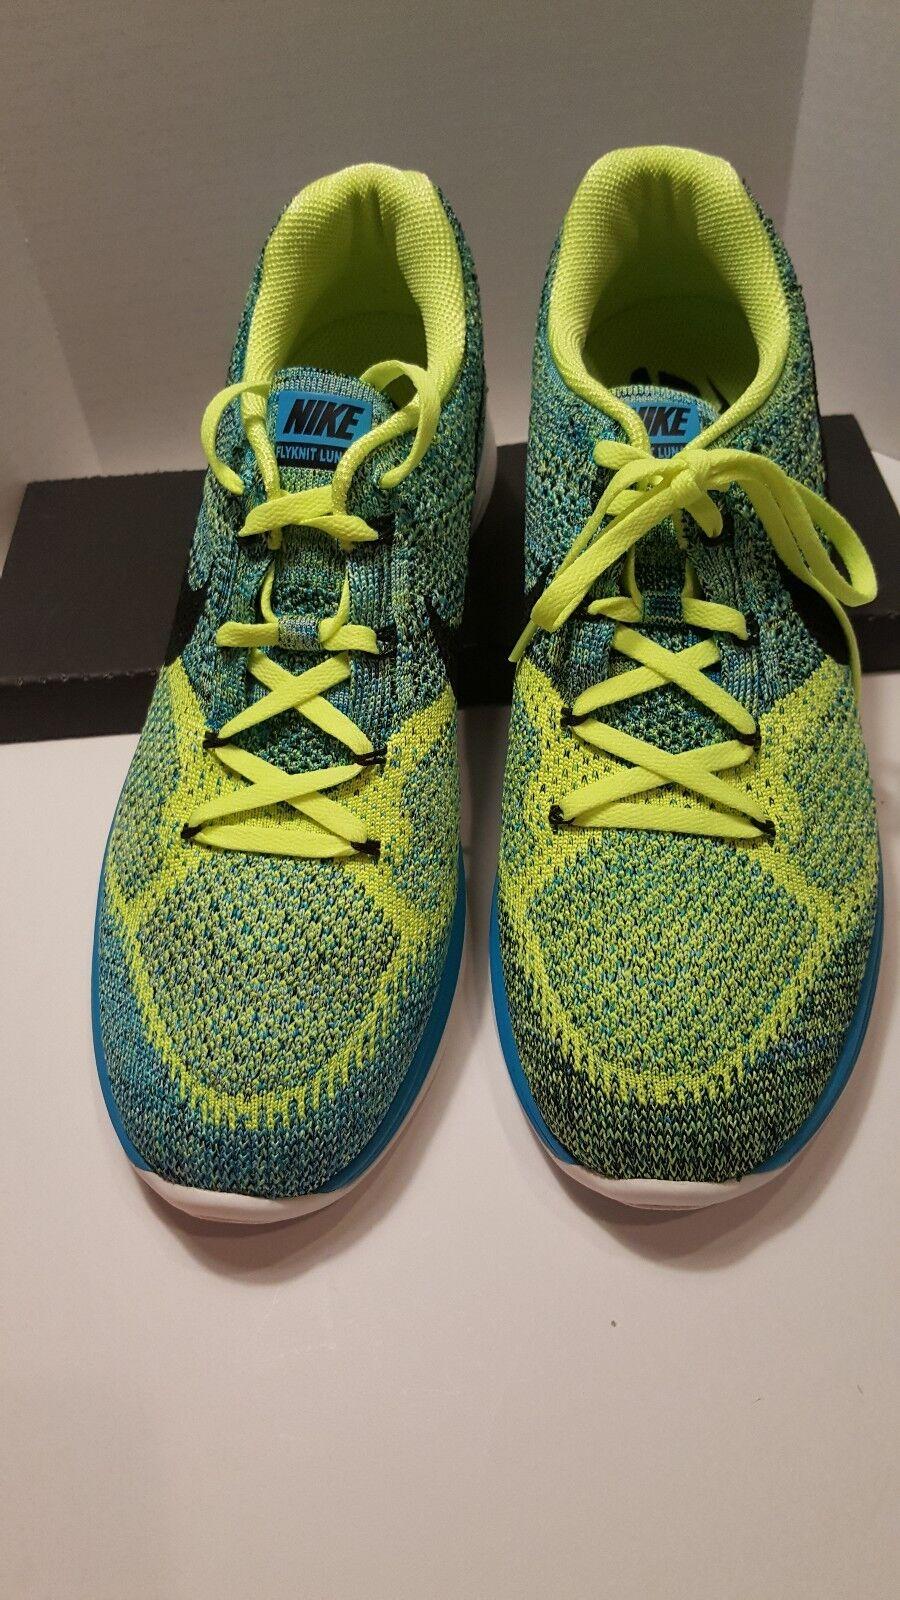 NEW Nike Flyknit Lunar 3 Blue Lagoon Black Volt 698181 403 Mens Shoes  Size 10.5